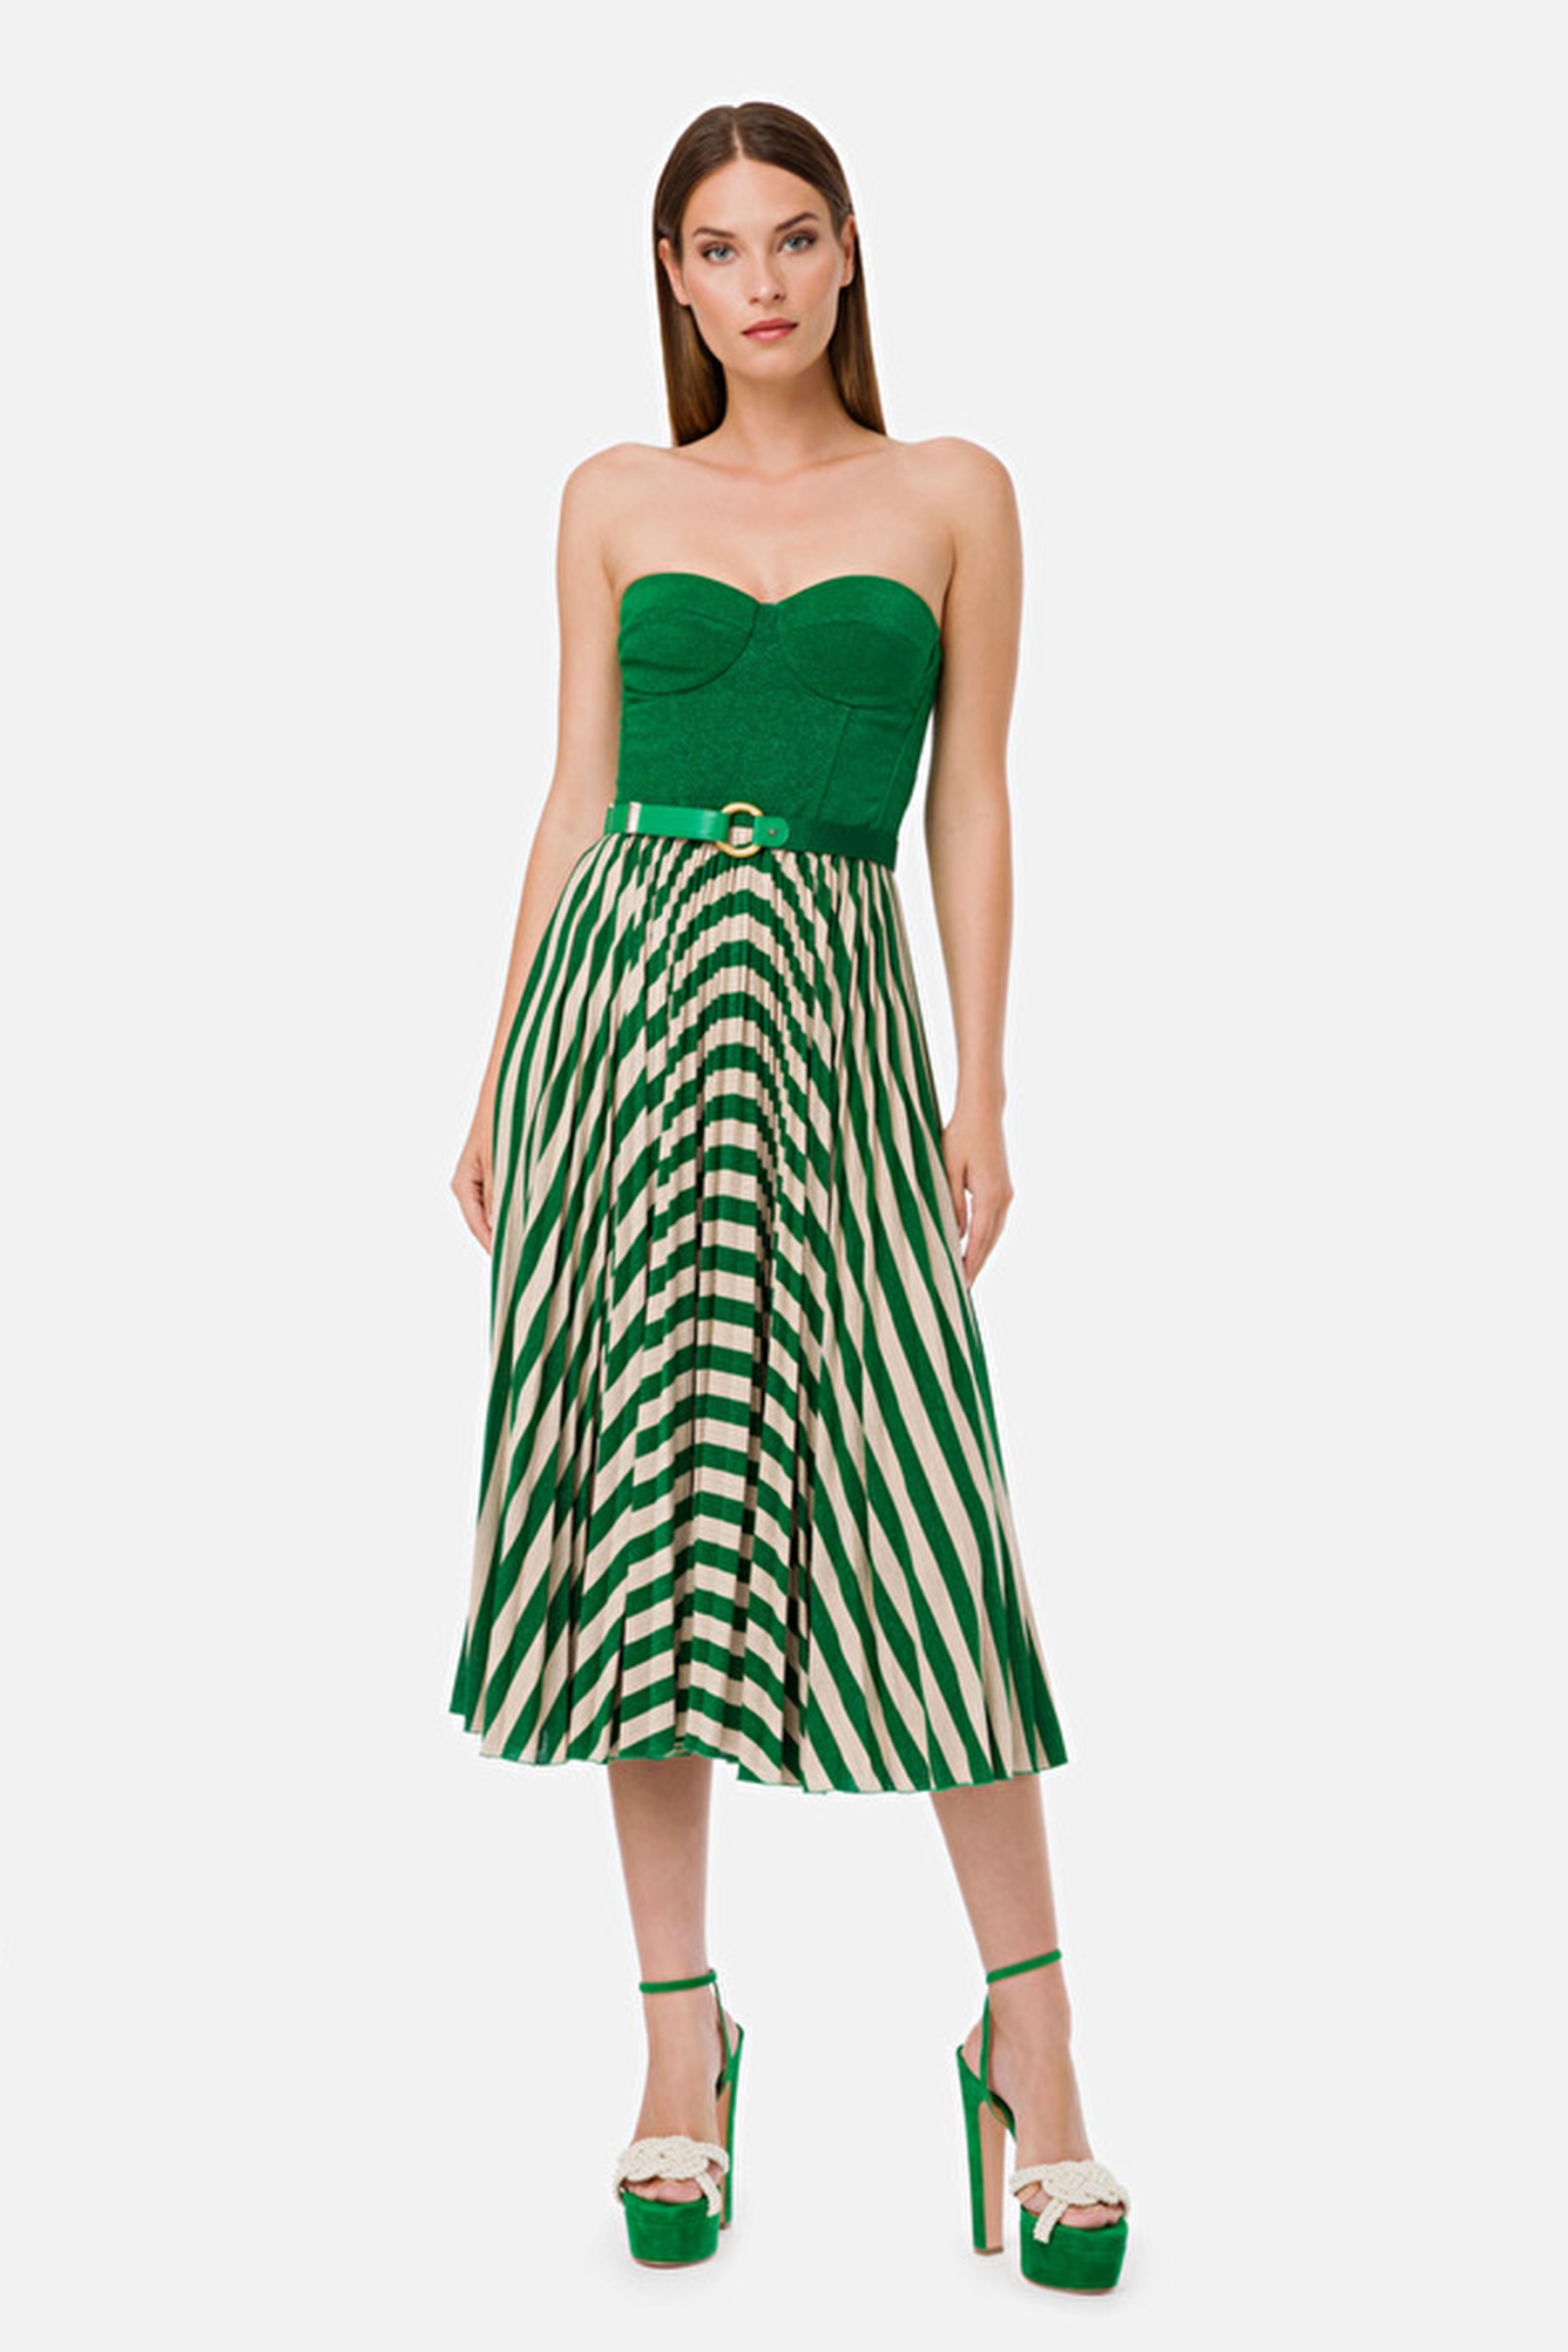 Sleeveless dress with belt ELISABETTA FRANCHI | Dresses | AB18001E2X02